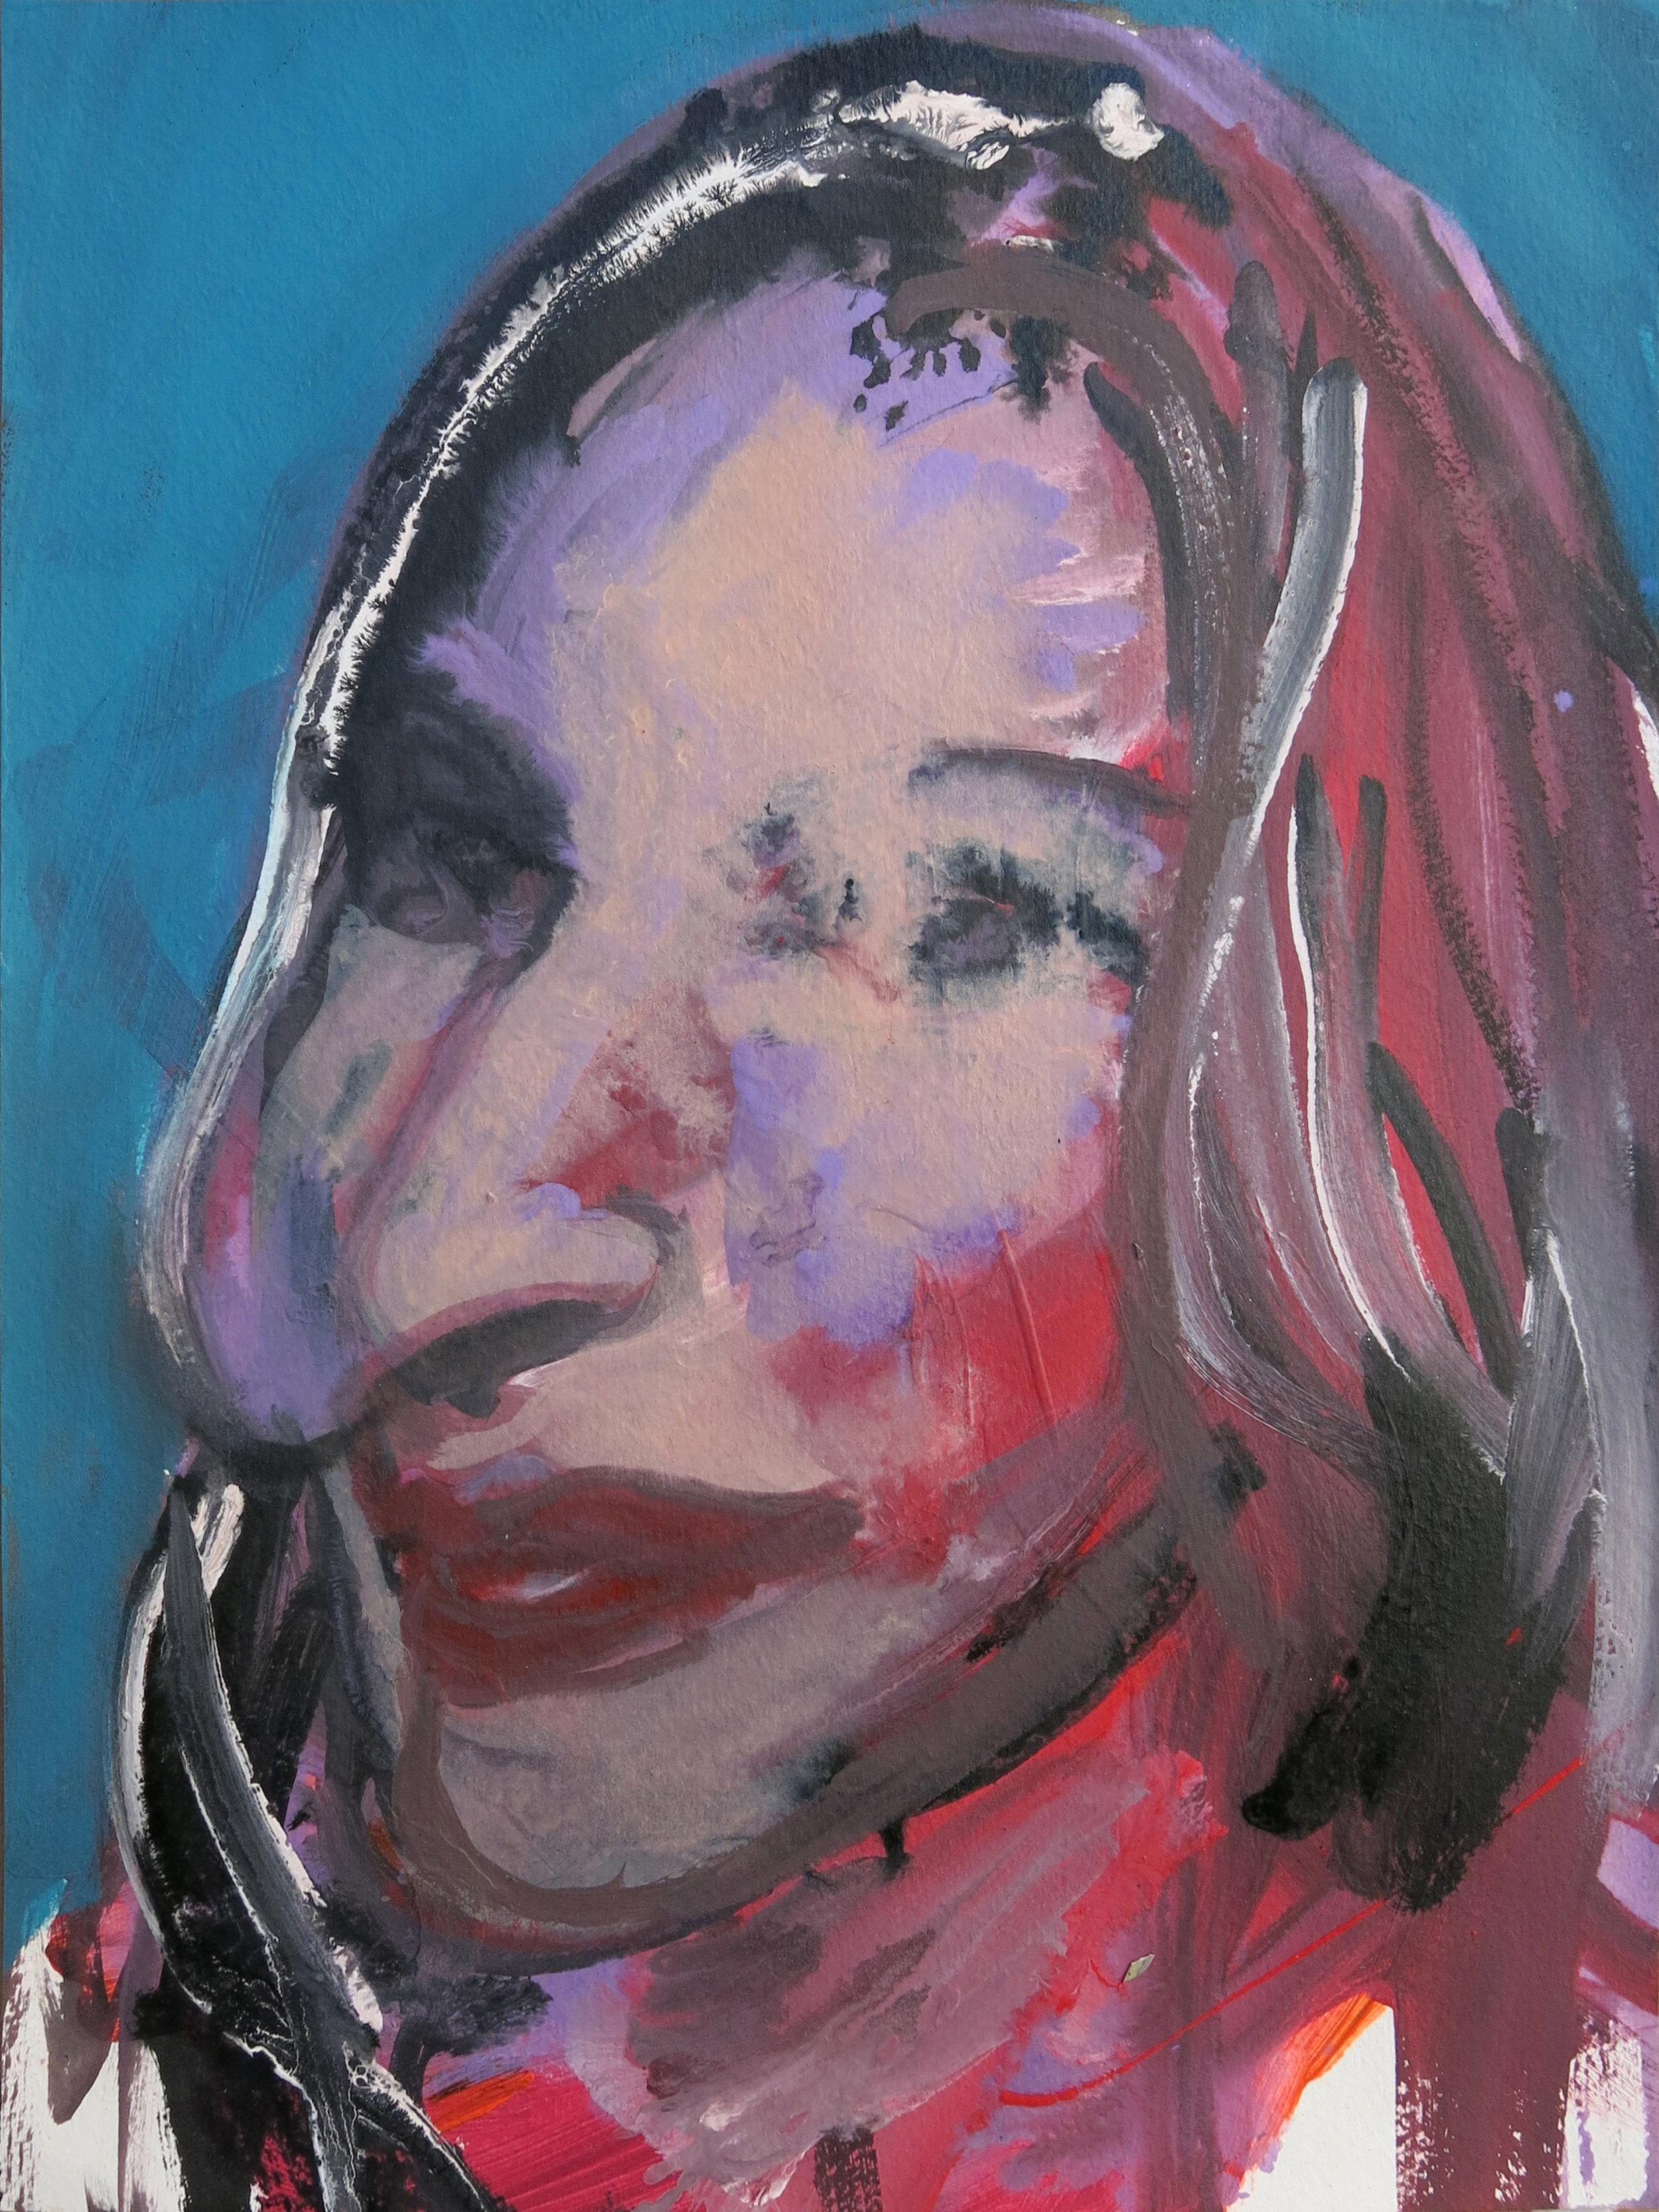 Barbra Streisand Portrait #102